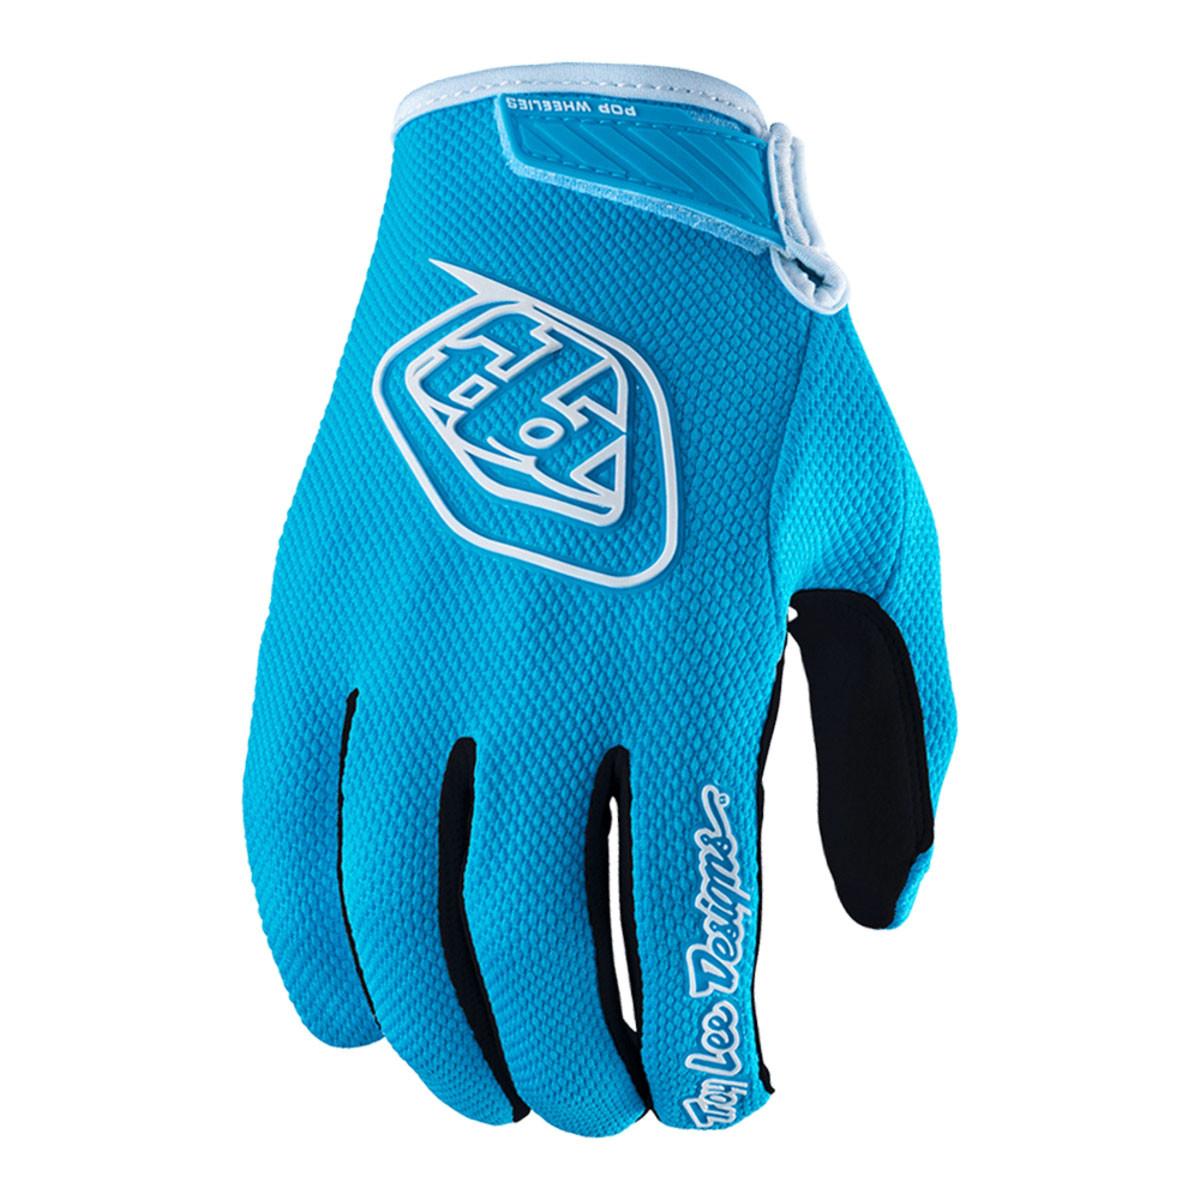 Перчатки Troy Lee Designs Air Glove, синие